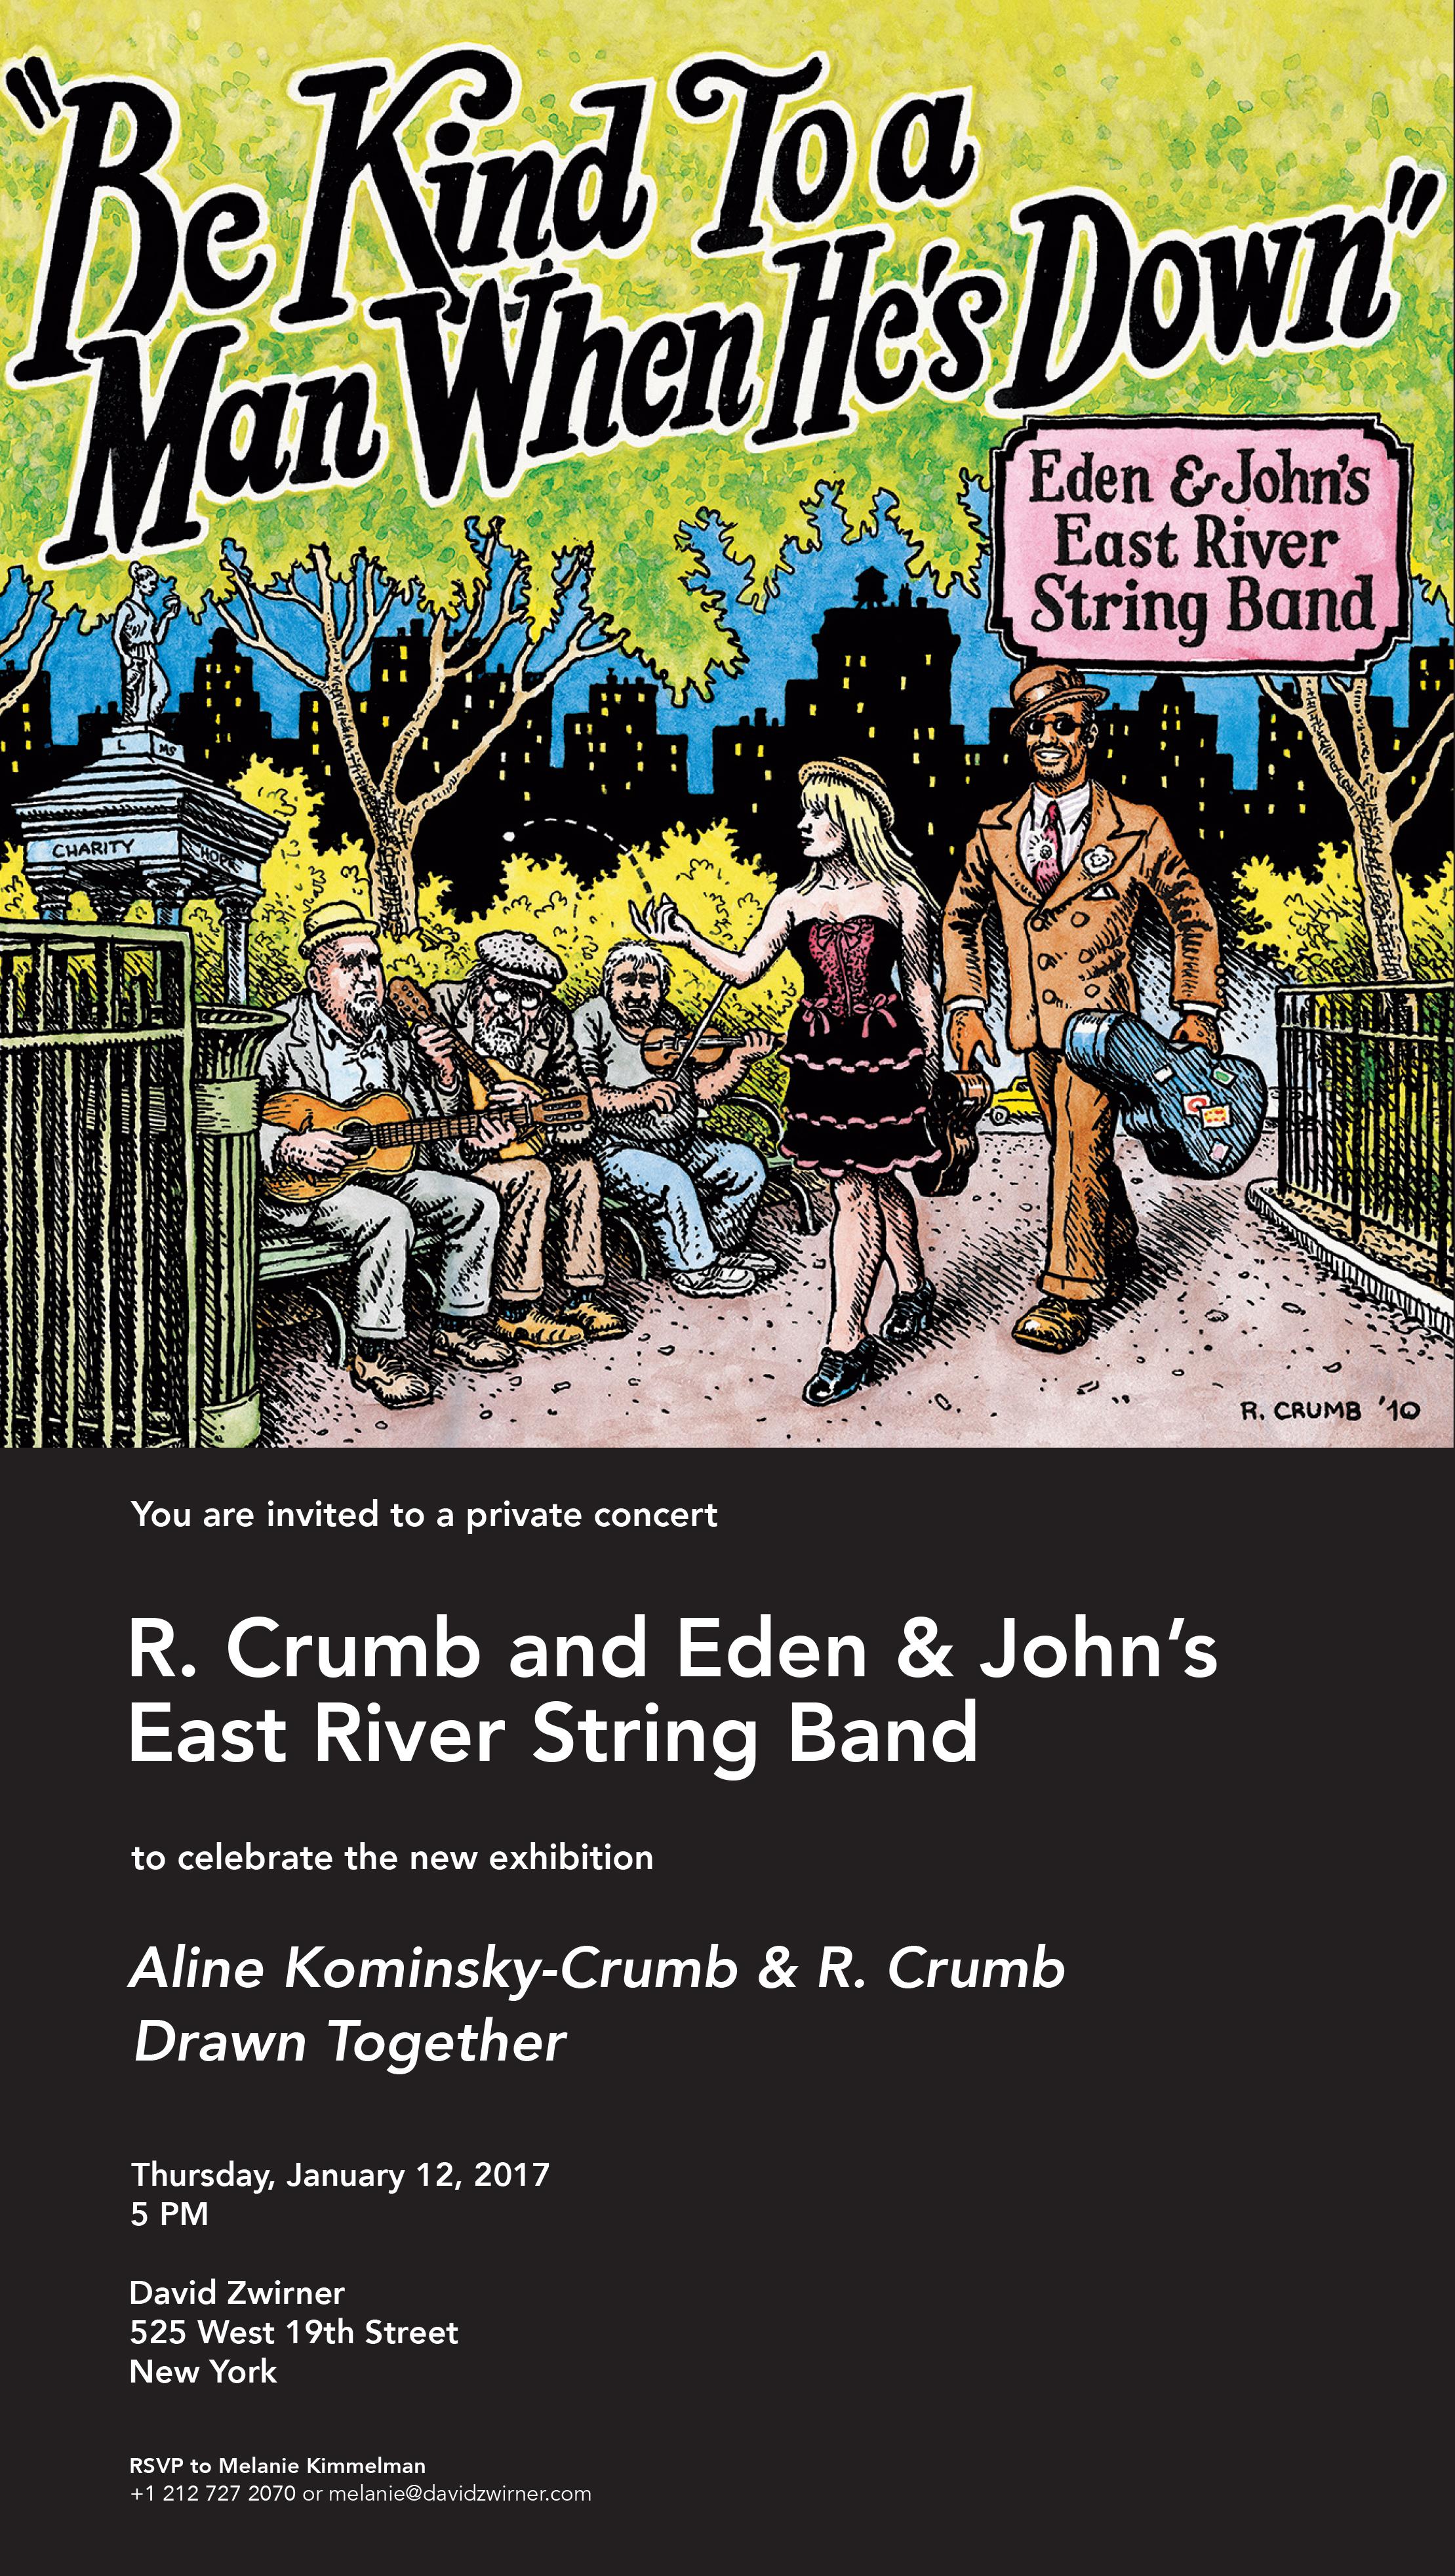 r. crumb eden brower john henghan east river string band